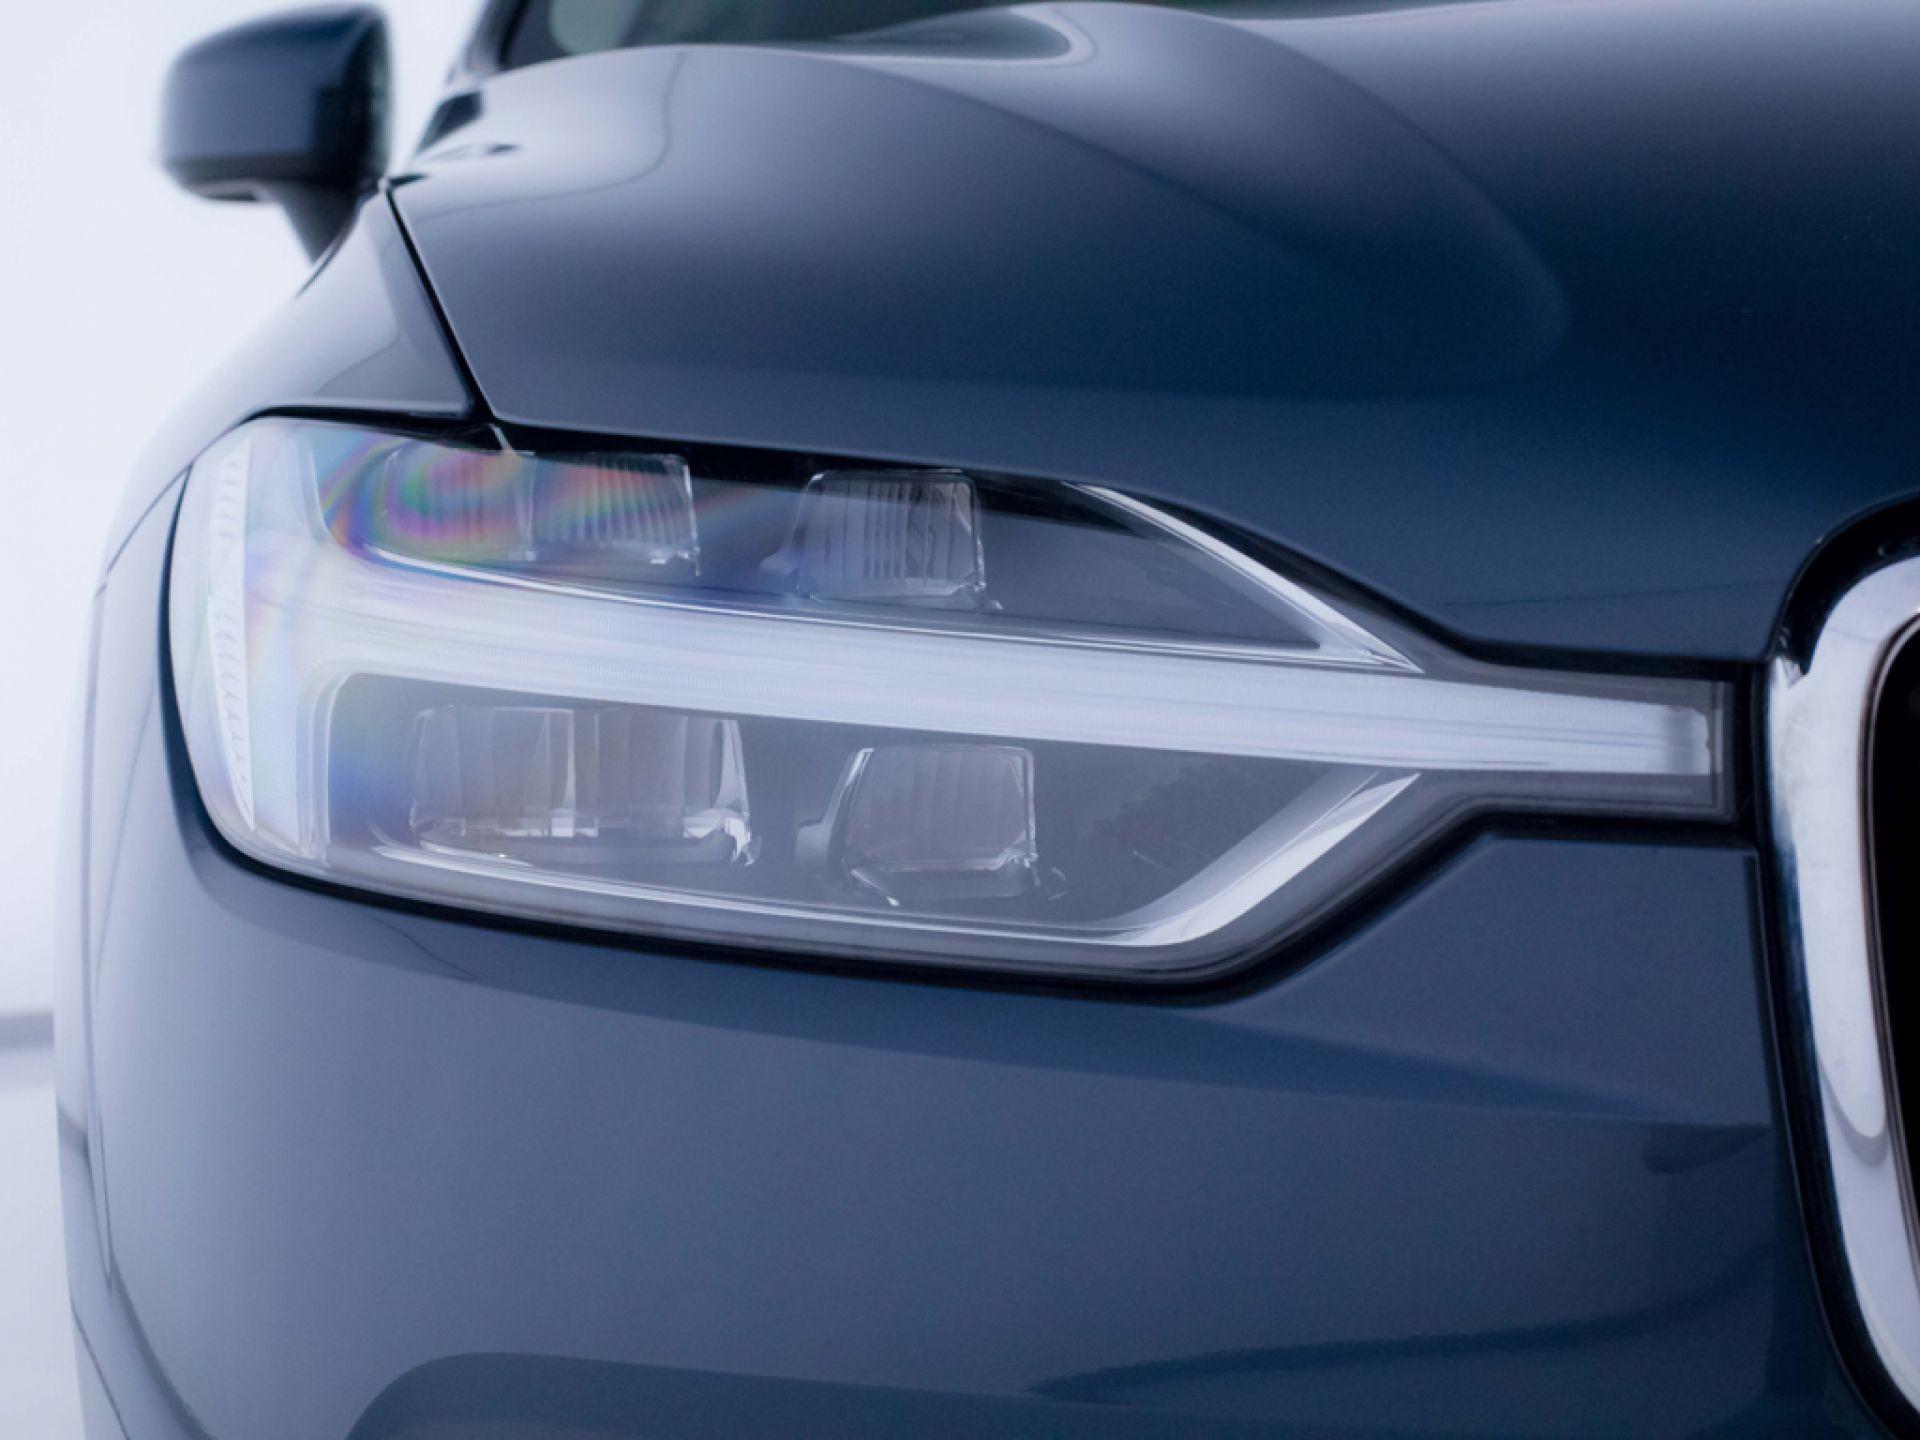 Volvo XC60 2.0 T5 AWD Momentum Auto